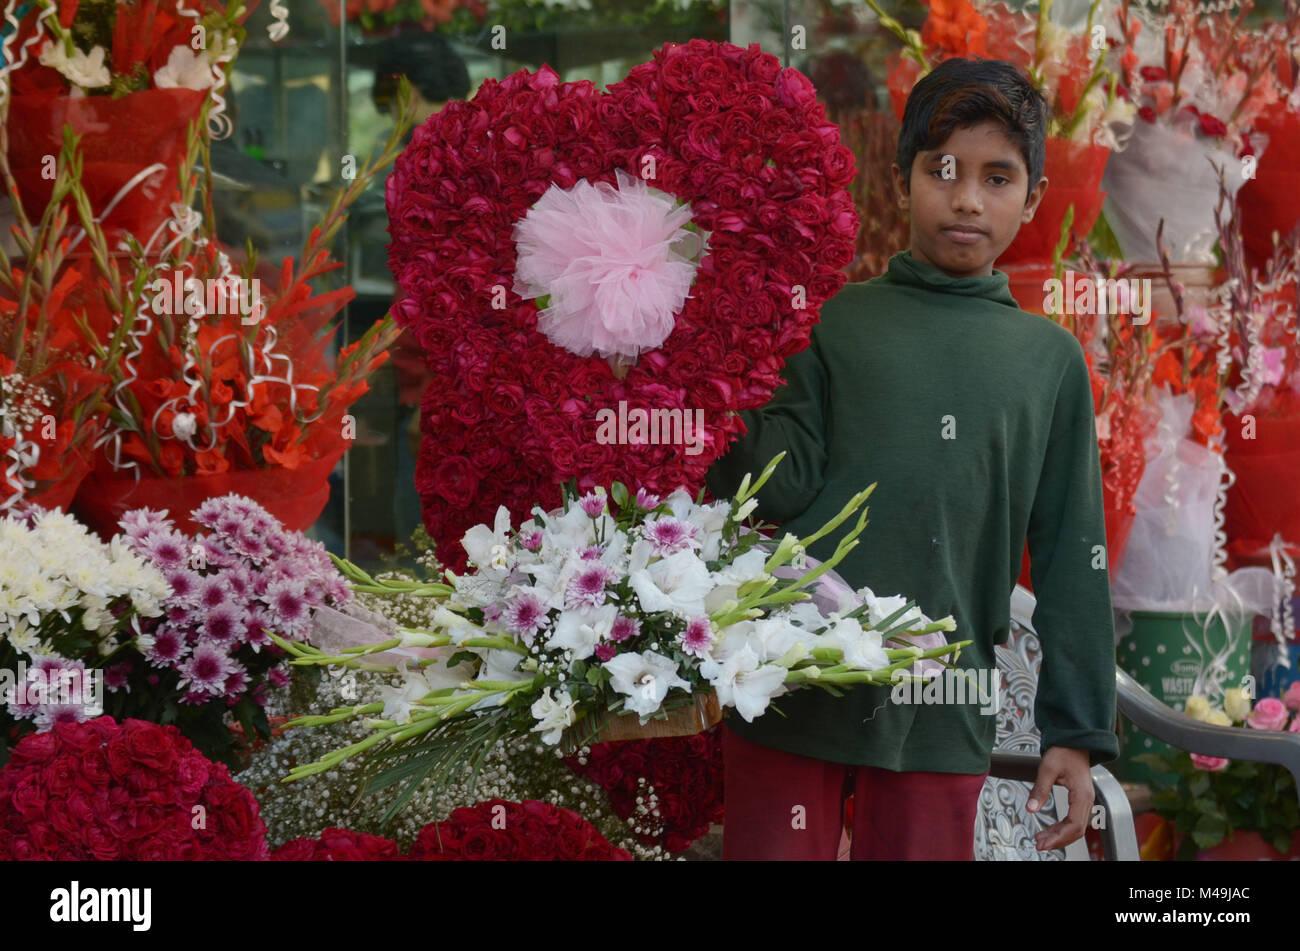 Pakistani people purchasing fresh roses flowers bouquets and pakistani people purchasing fresh roses flowers bouquets and garlands m49jacg izmirmasajfo